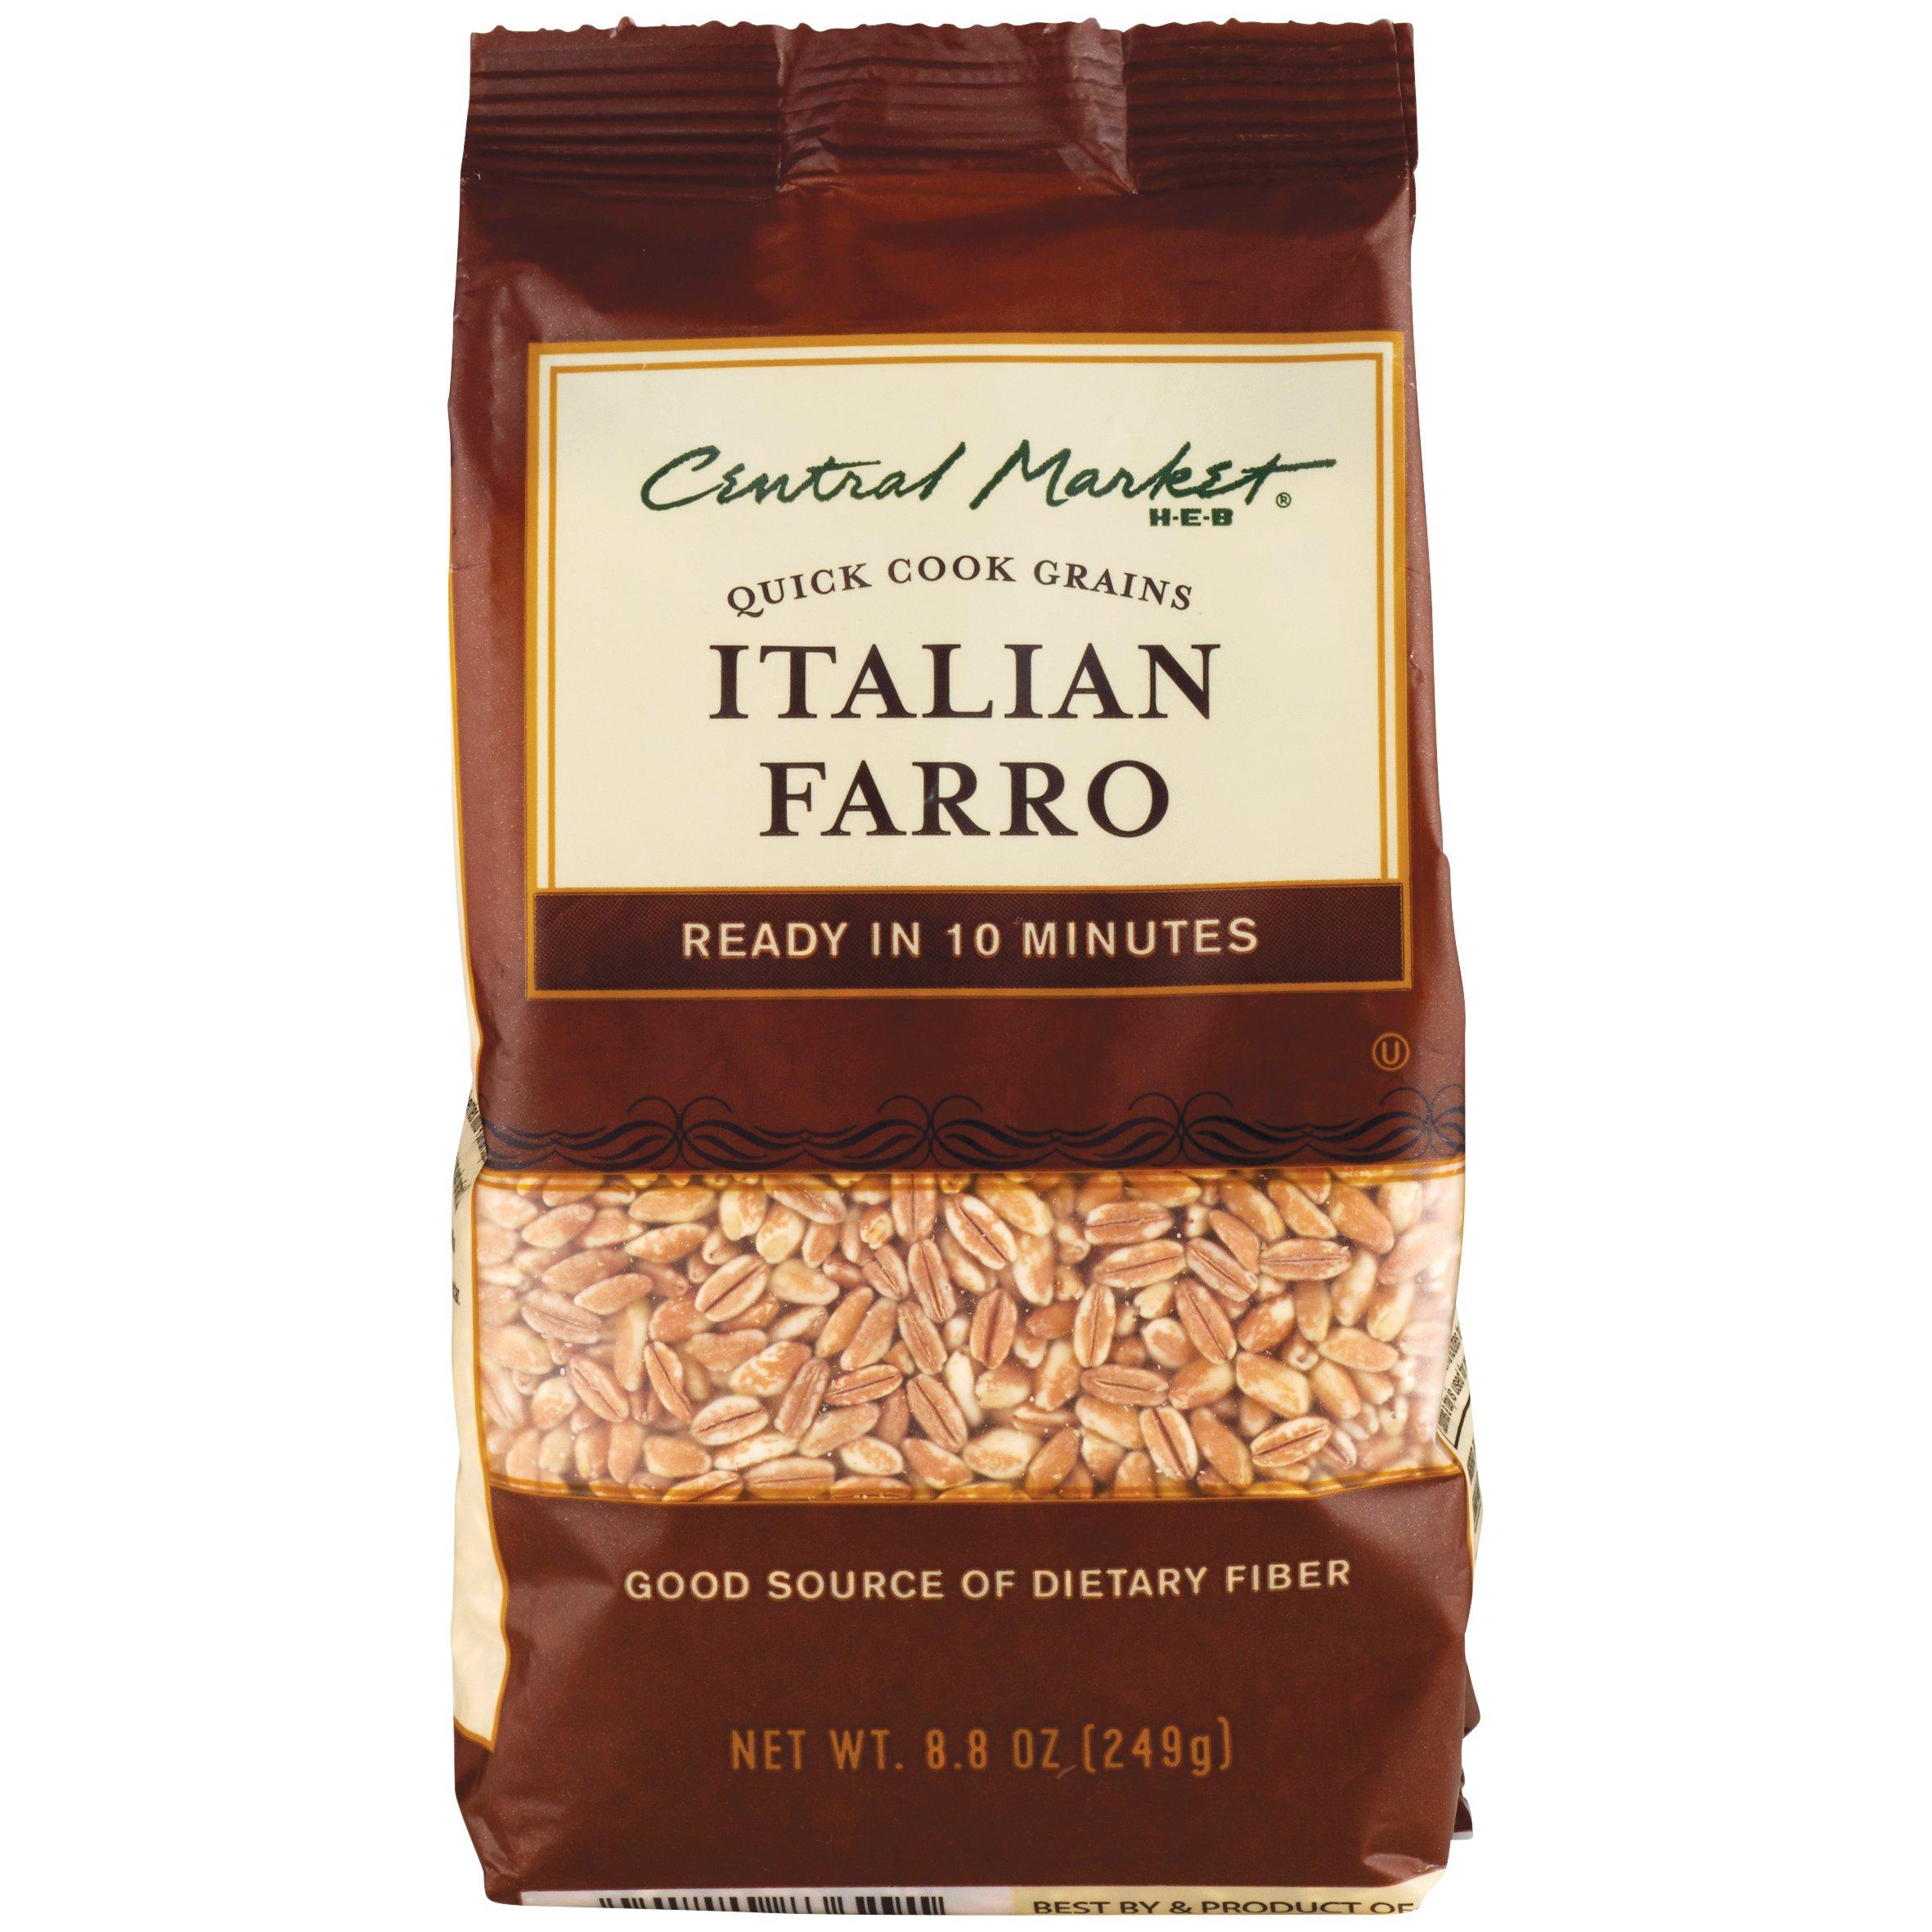 Italian Farro Quick Cook Grains